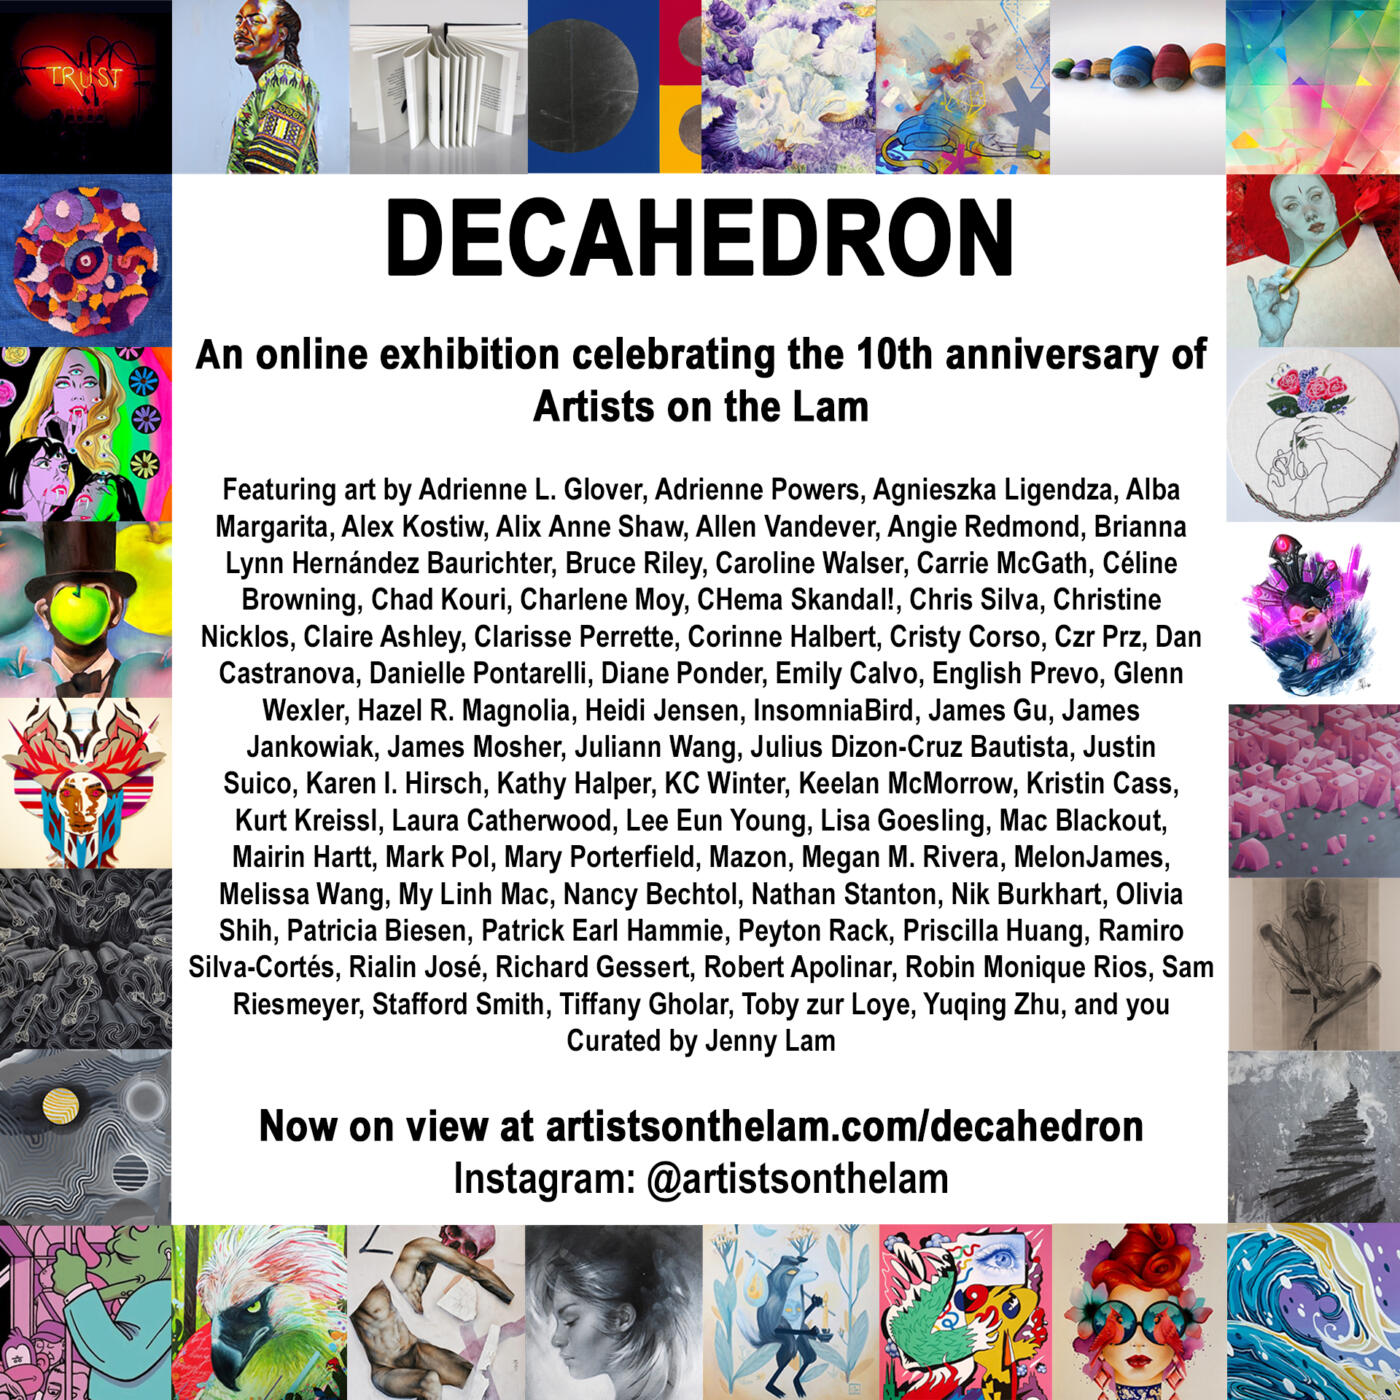 DECAHEDRON Promo Graphic